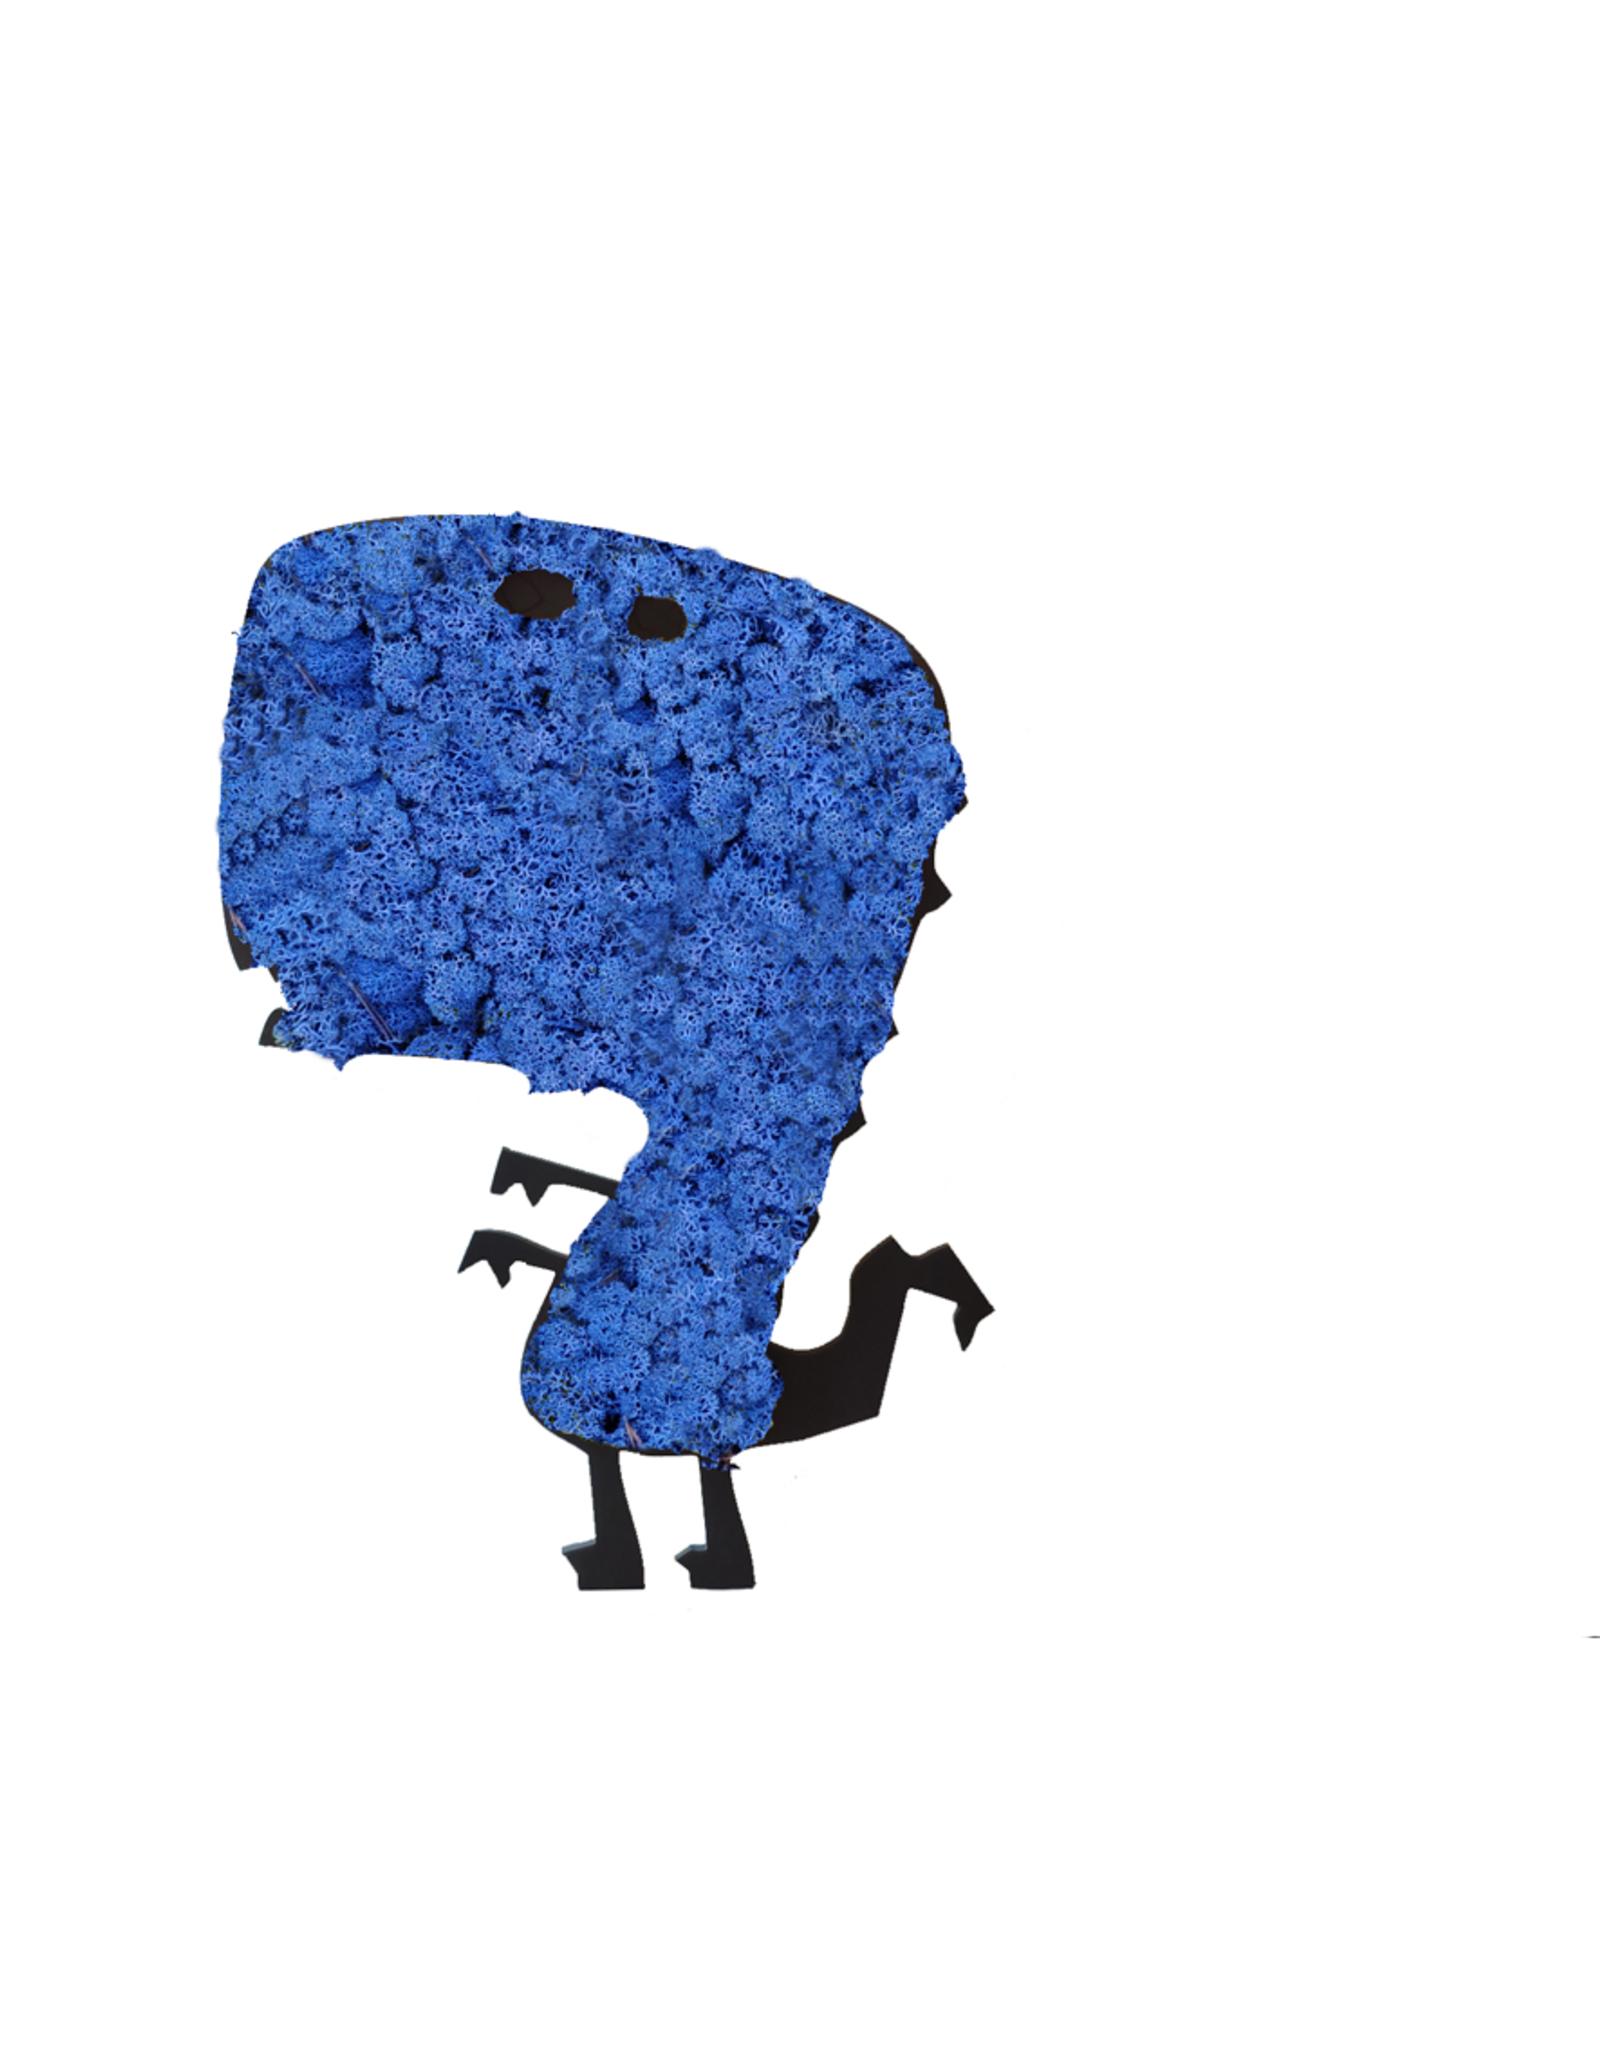 Mosbeestje: Grumpy